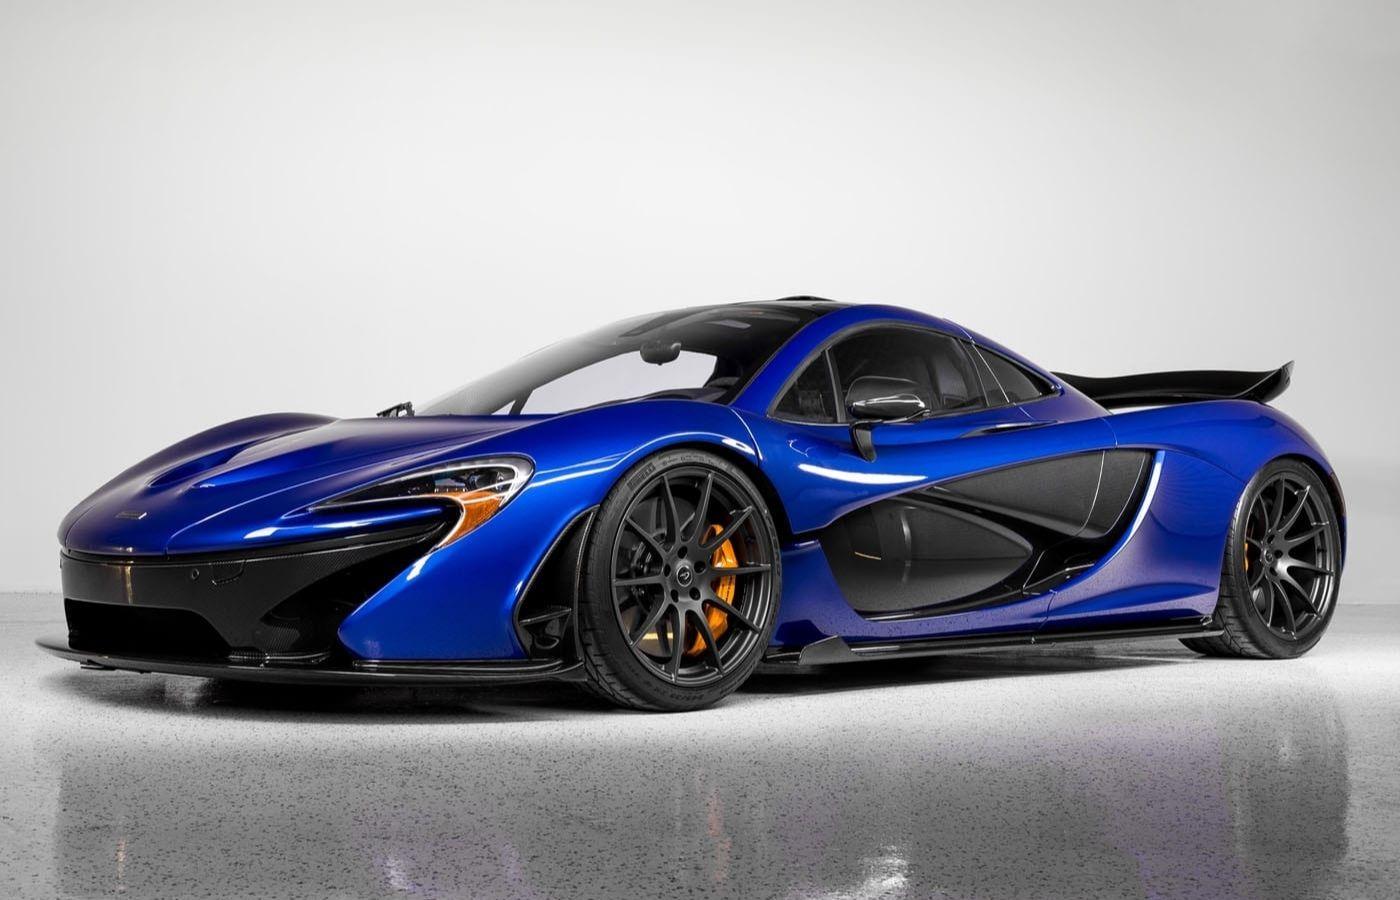 deadmau5 subasta su icónico McLaren P1